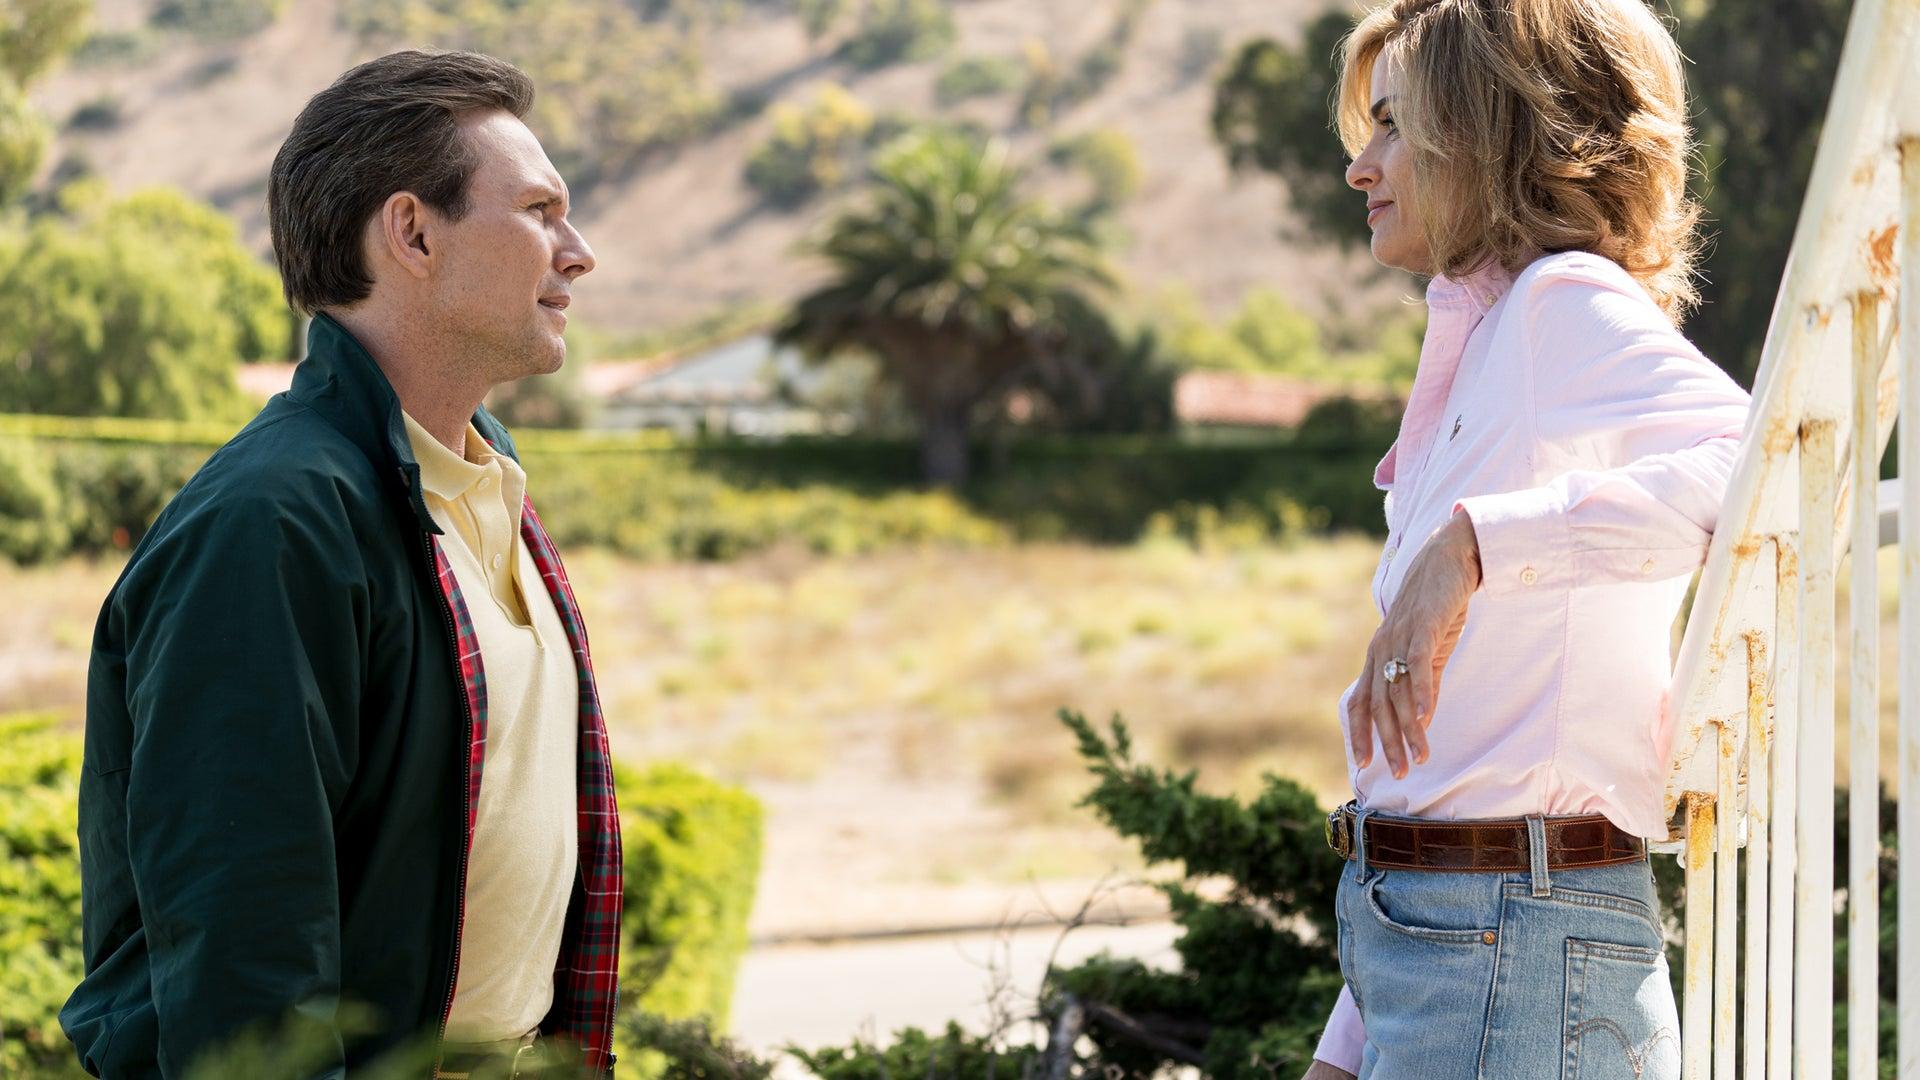 Christian Slater and Amanda Peet, Dirty John: The Betty Broderick Story